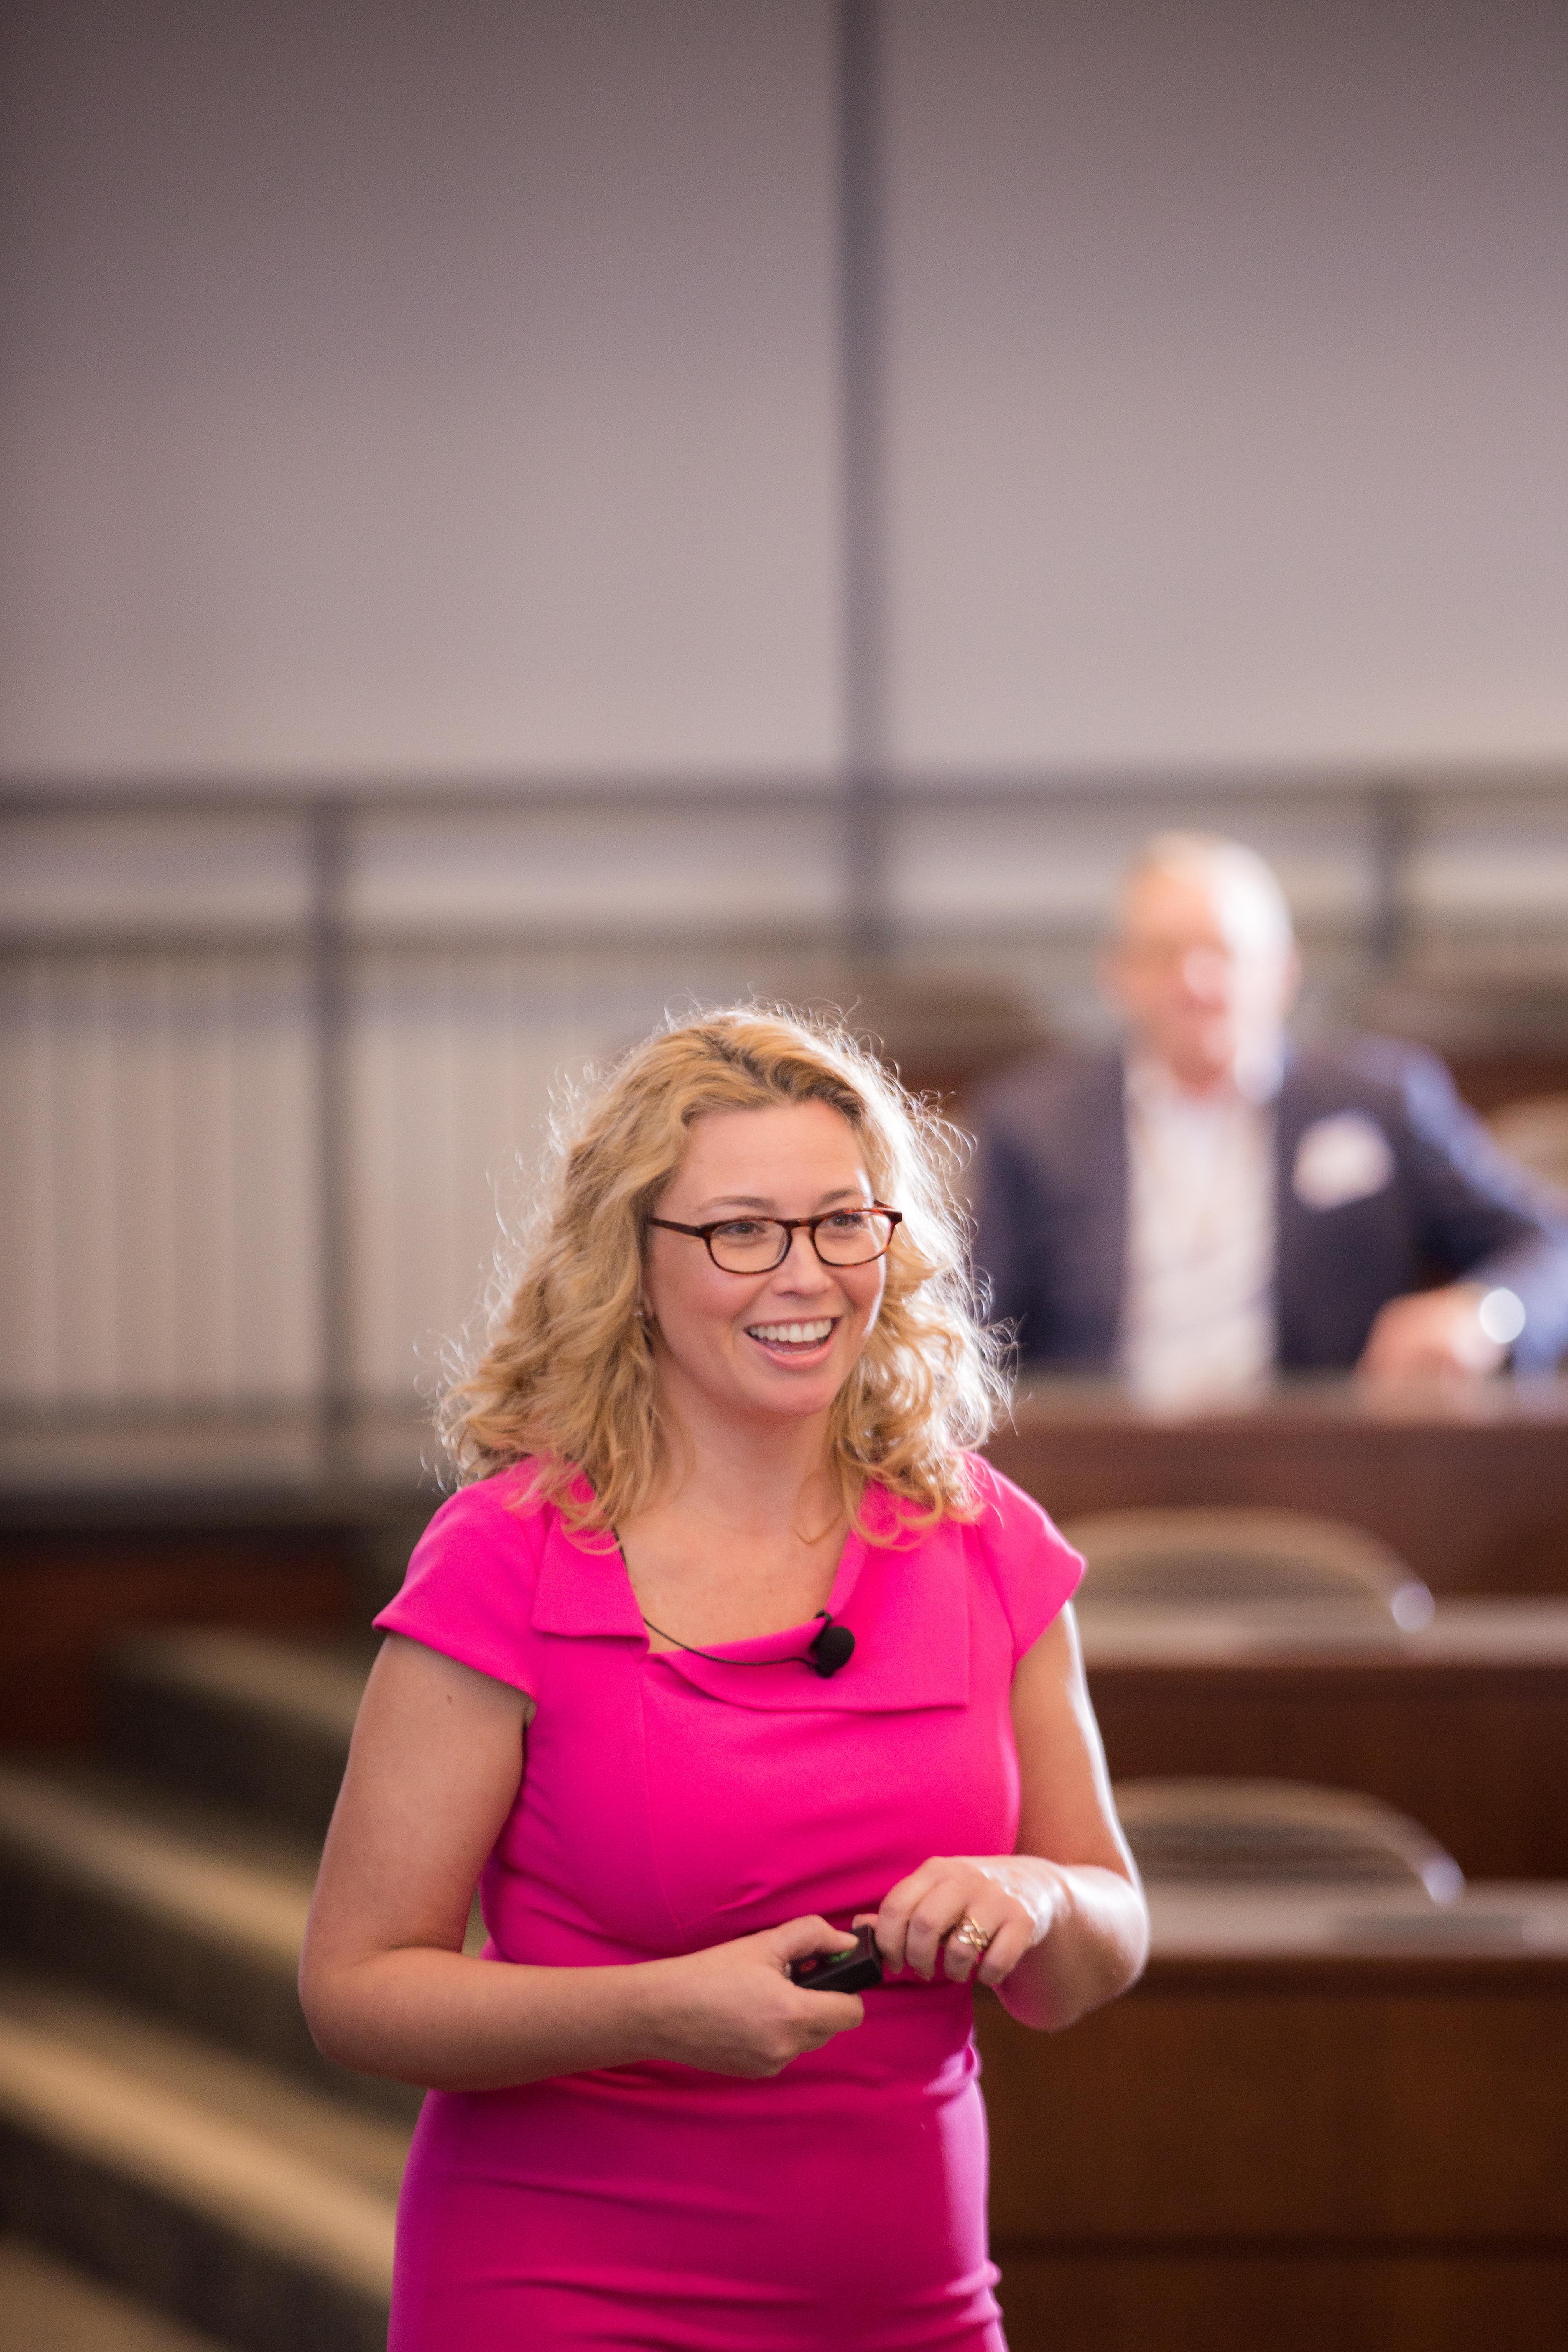 Heather Vickery, Success and Leadership Coach, Keynote Speaker, ILEA Day of Education.